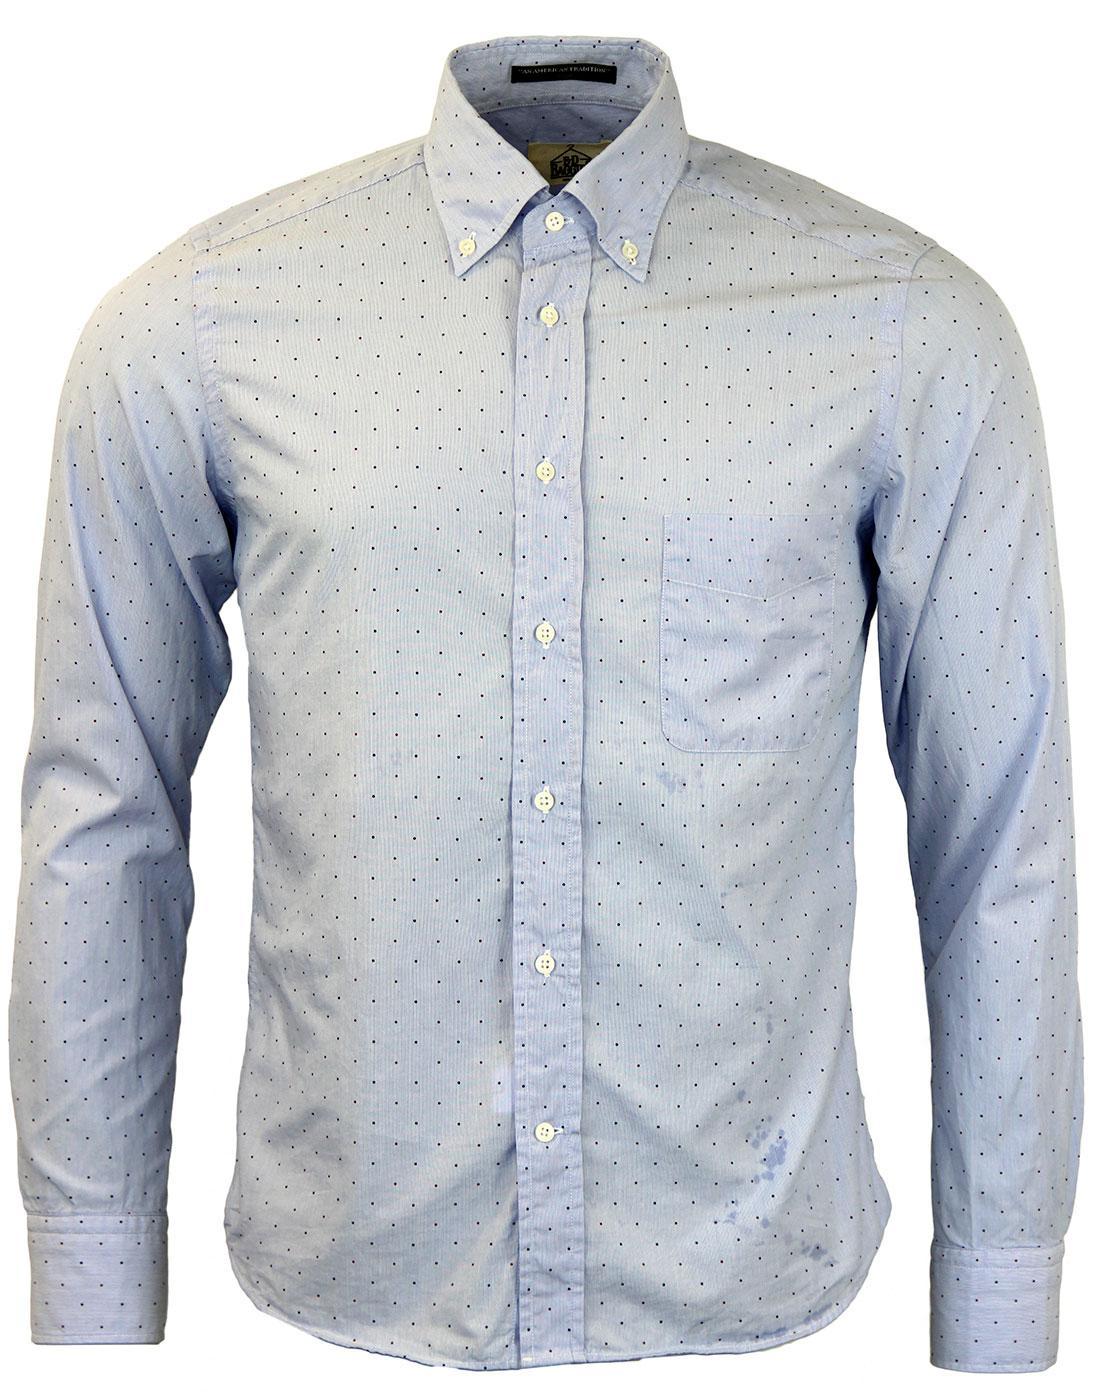 Dexter B D BAGGIES Mod Slim Multi Pin Dot Shirt